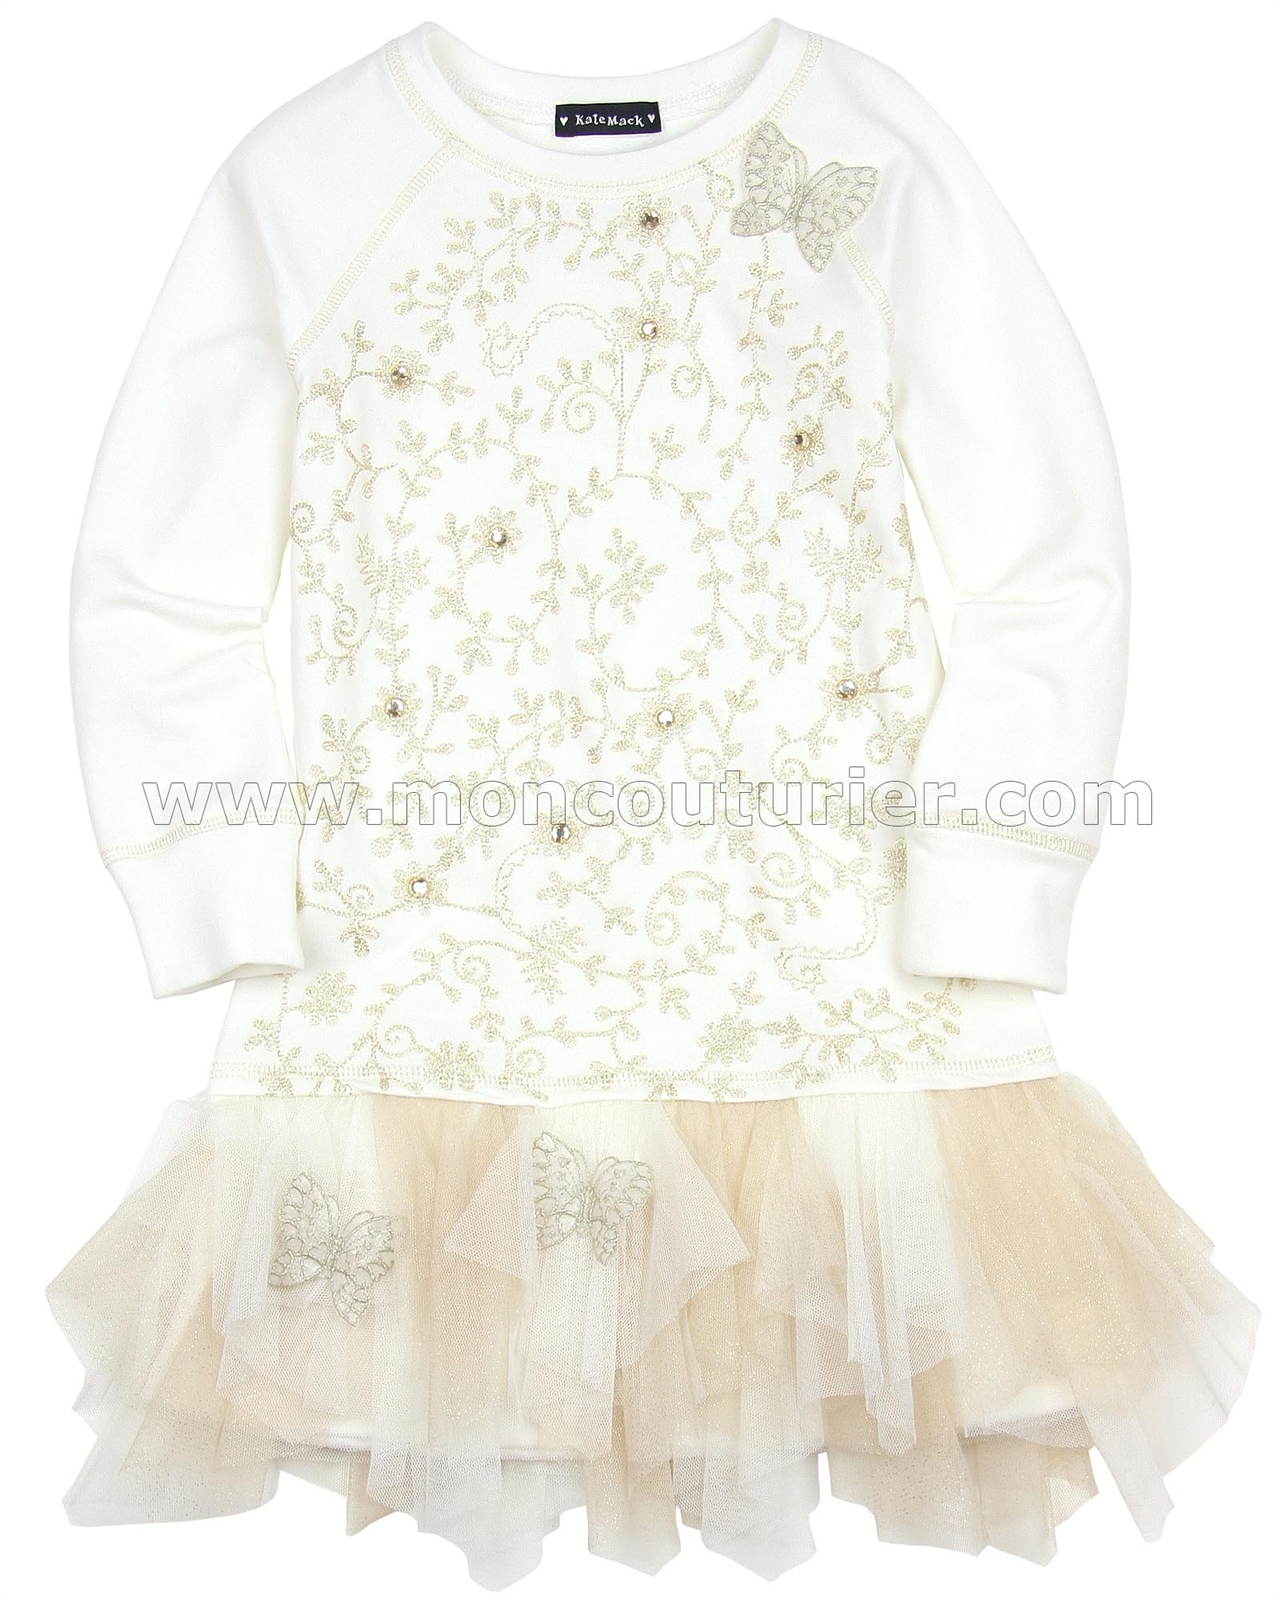 ee47efa36d3 Kate Mack Spun Gold Dress with Netting Cream